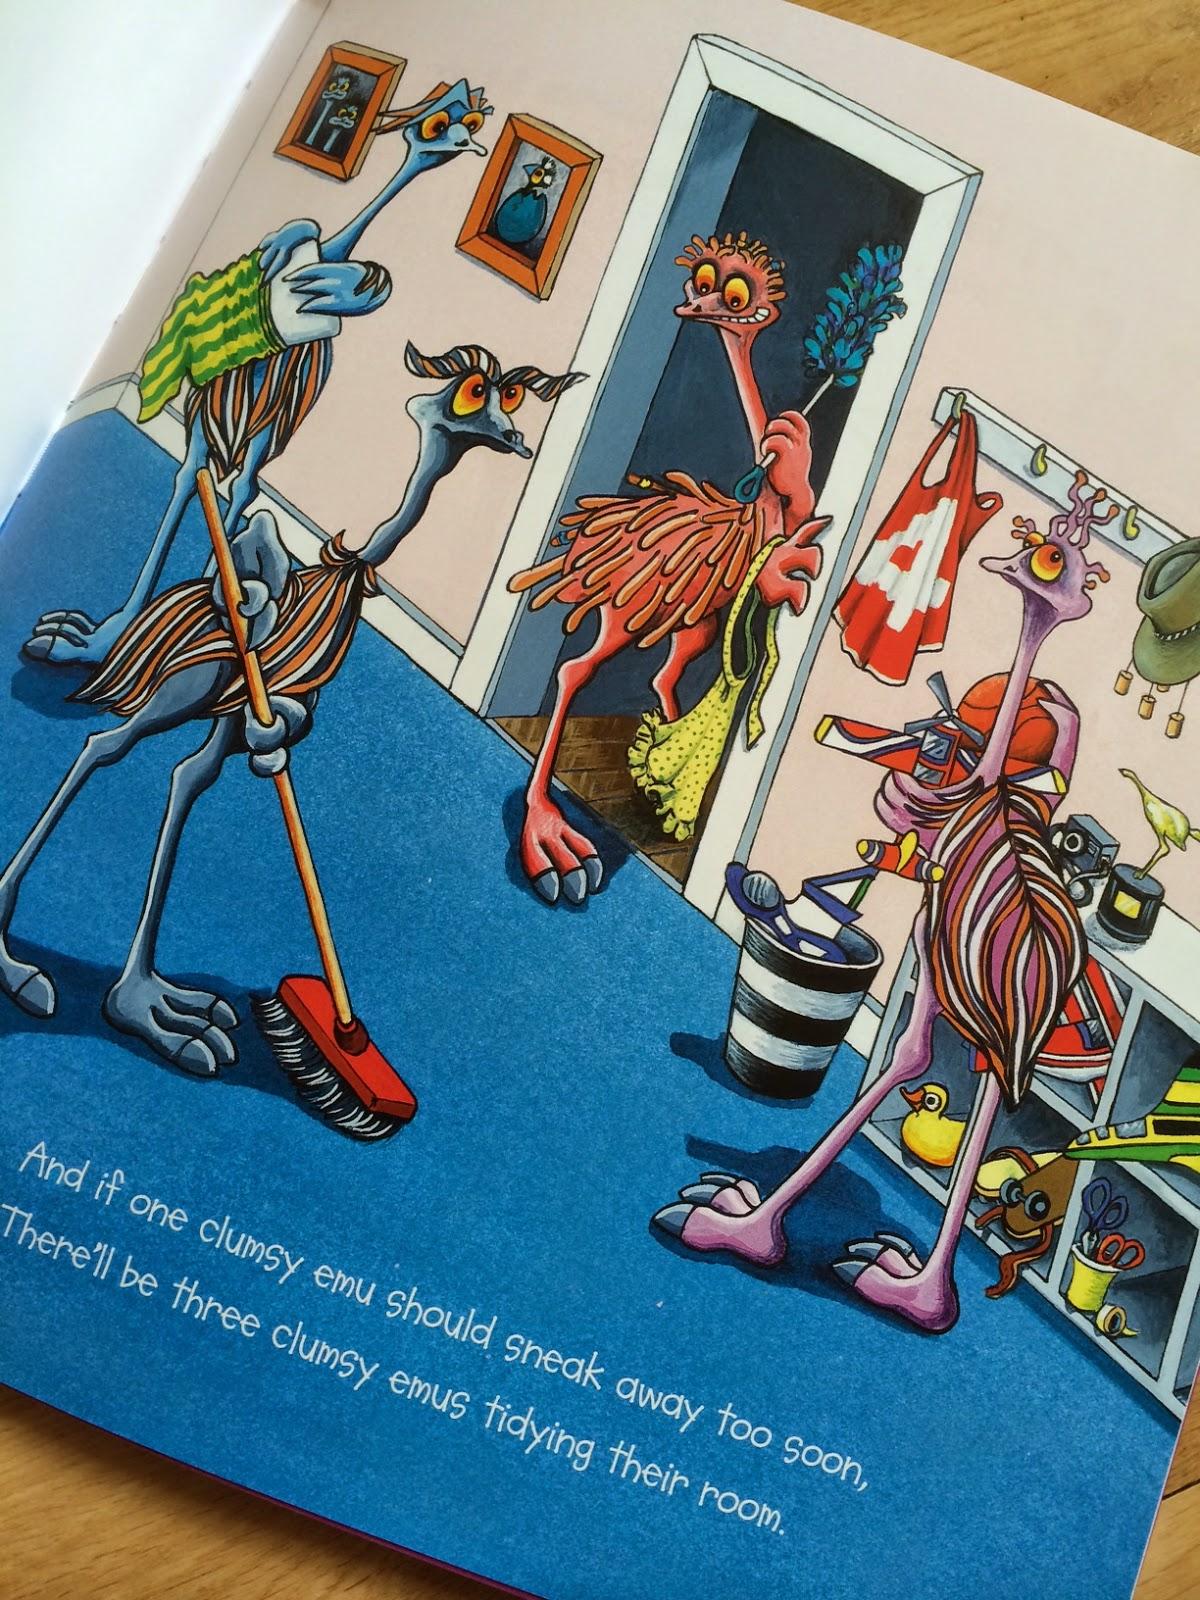 Sneak peek inside Ten Clumsy Emus by Ed Allen and illustrated by Wendy Binks